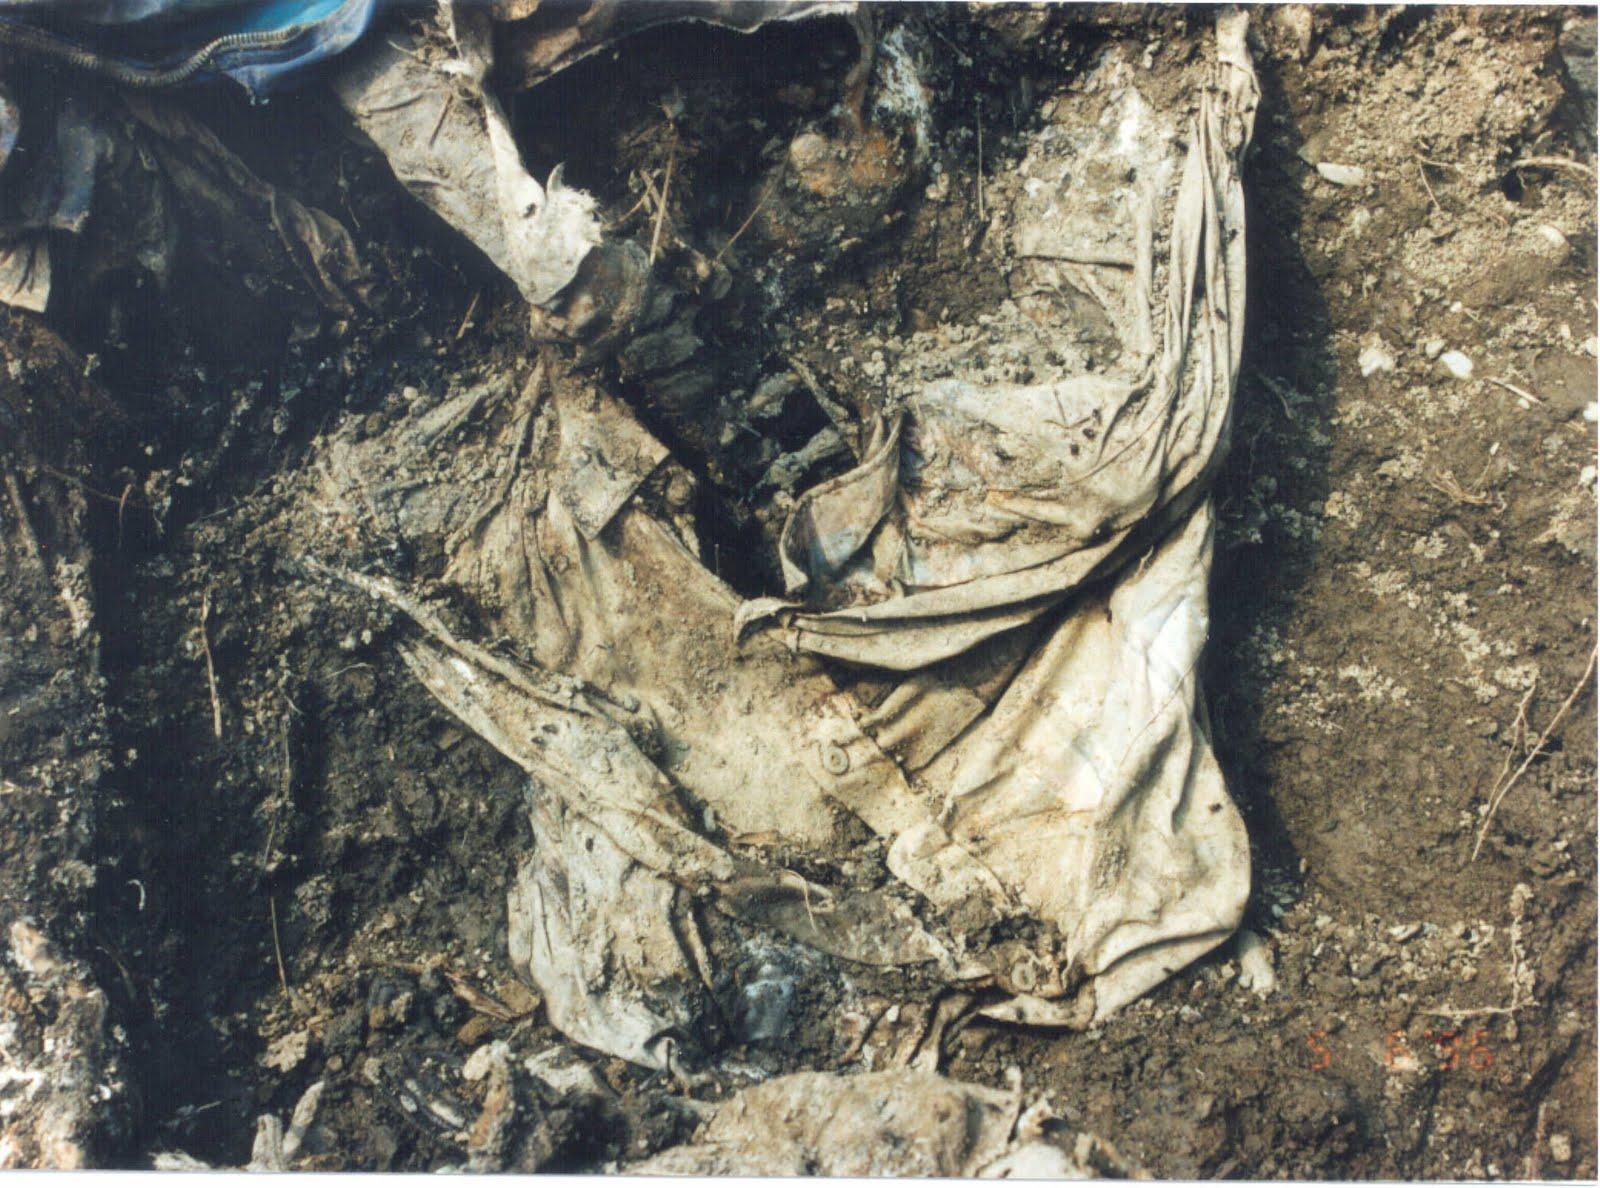 ... Srebrenica massacre. Exhibit P31. Photo courtesy of the International